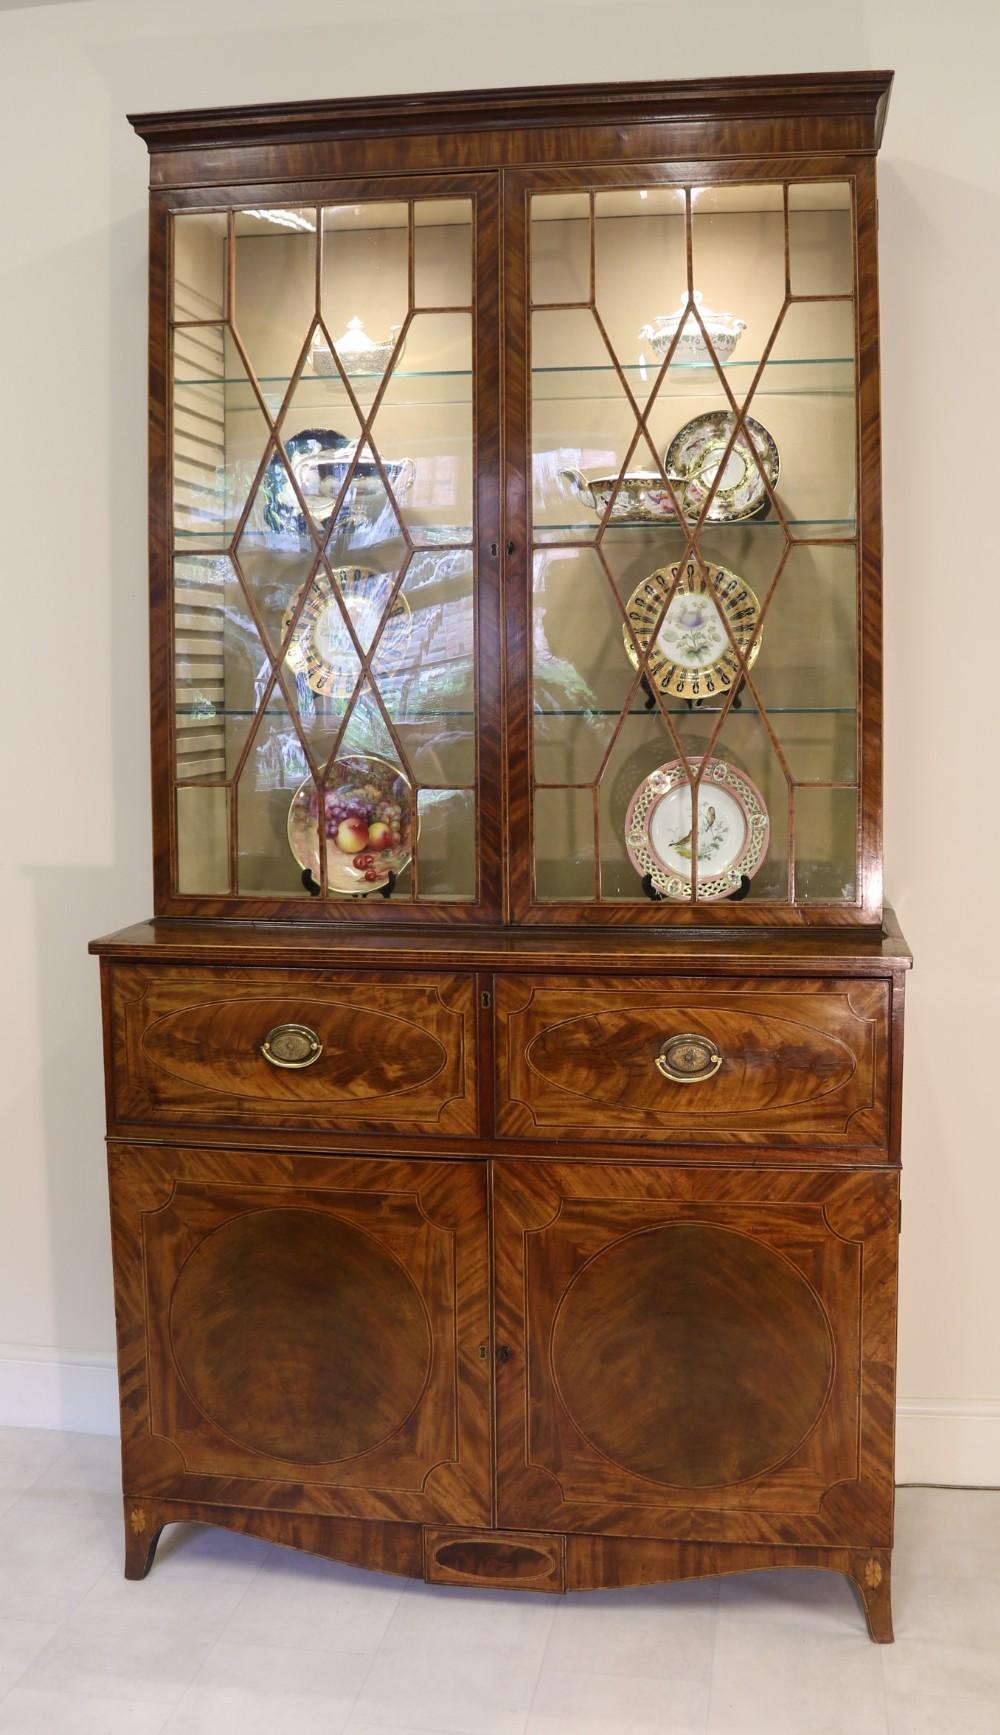 a superb george iii period inlaid flame mahogany secretaire bookcasedisplay cabinet